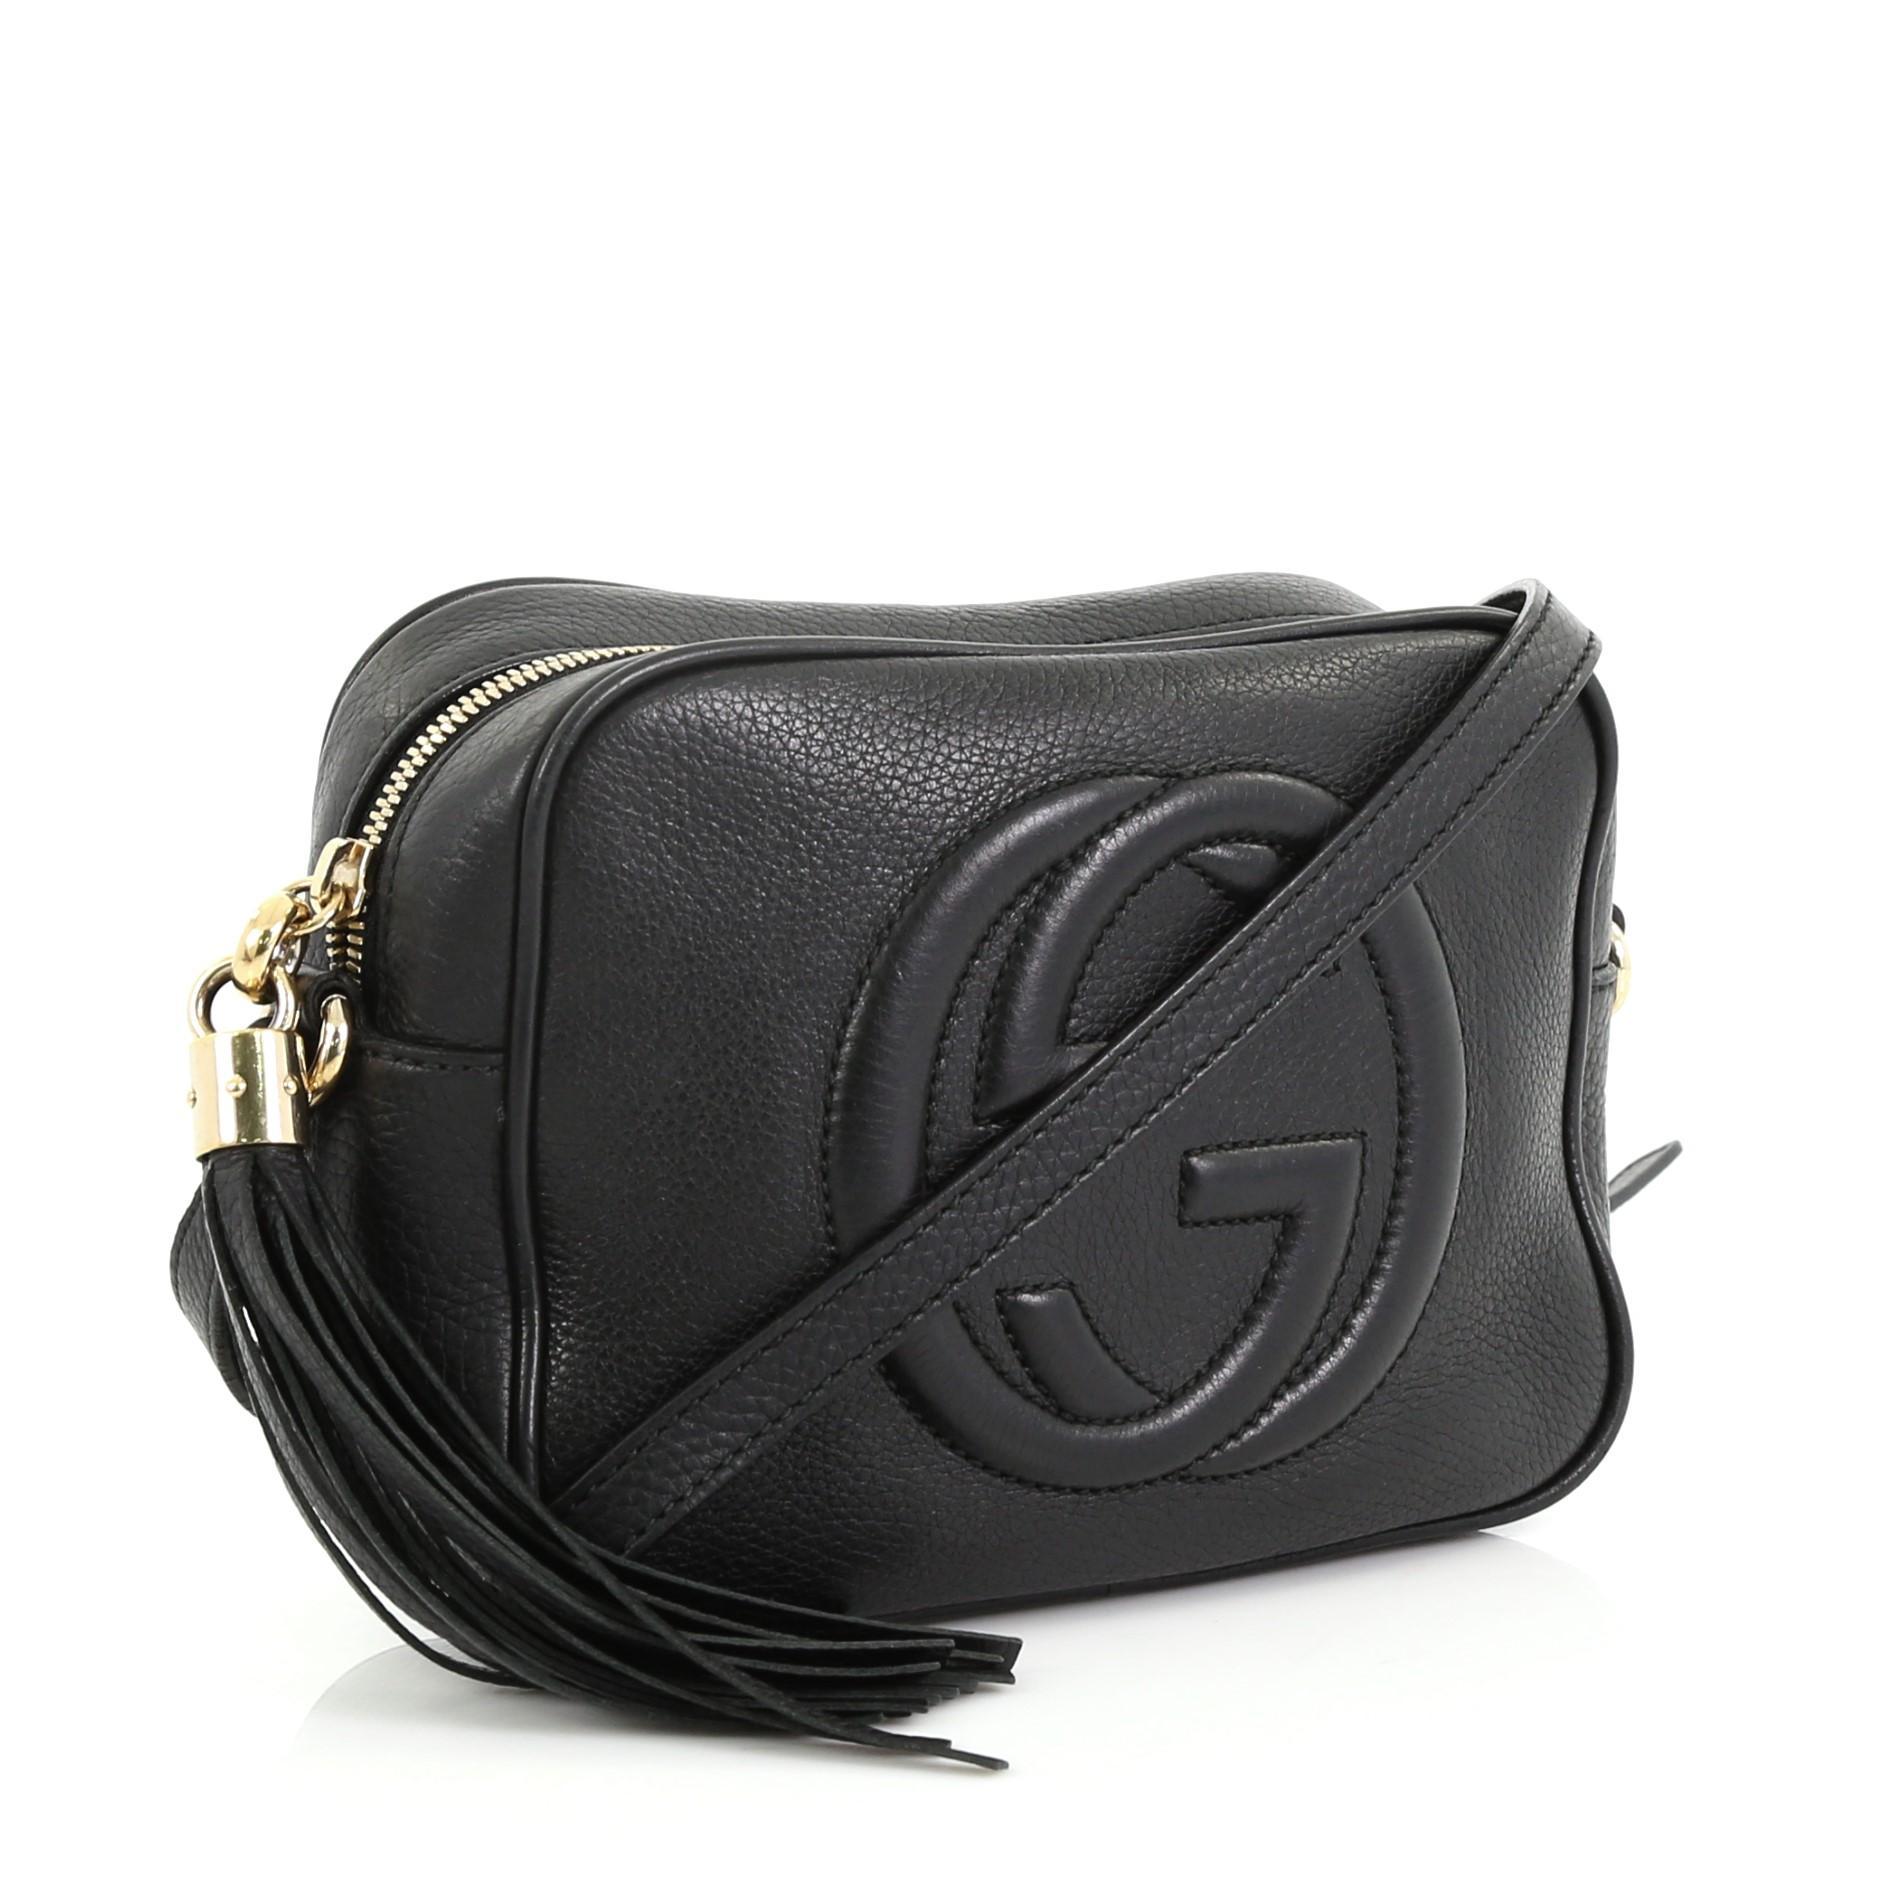 ff376b294 Gucci Soho Disco Crossbody Bag Leather Small at 1stdibs